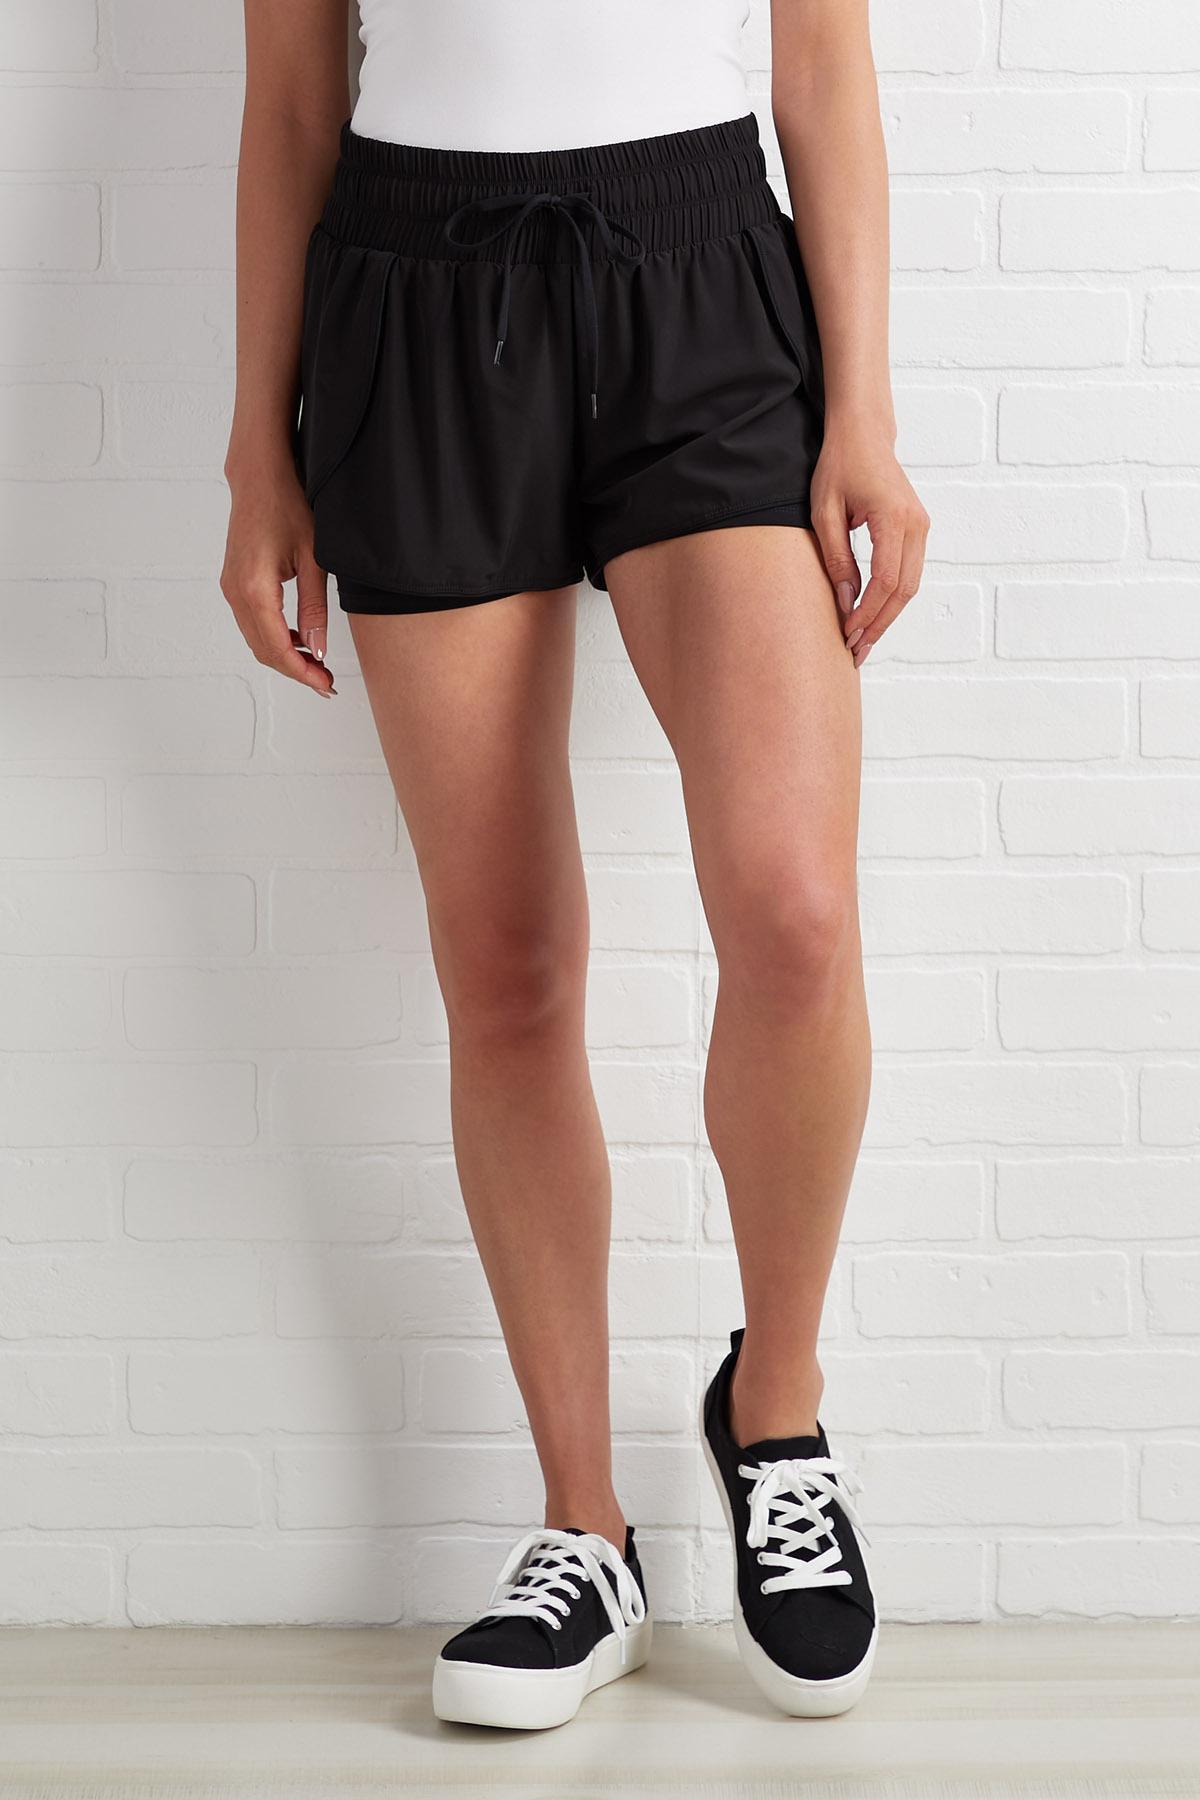 On The Run Shorts